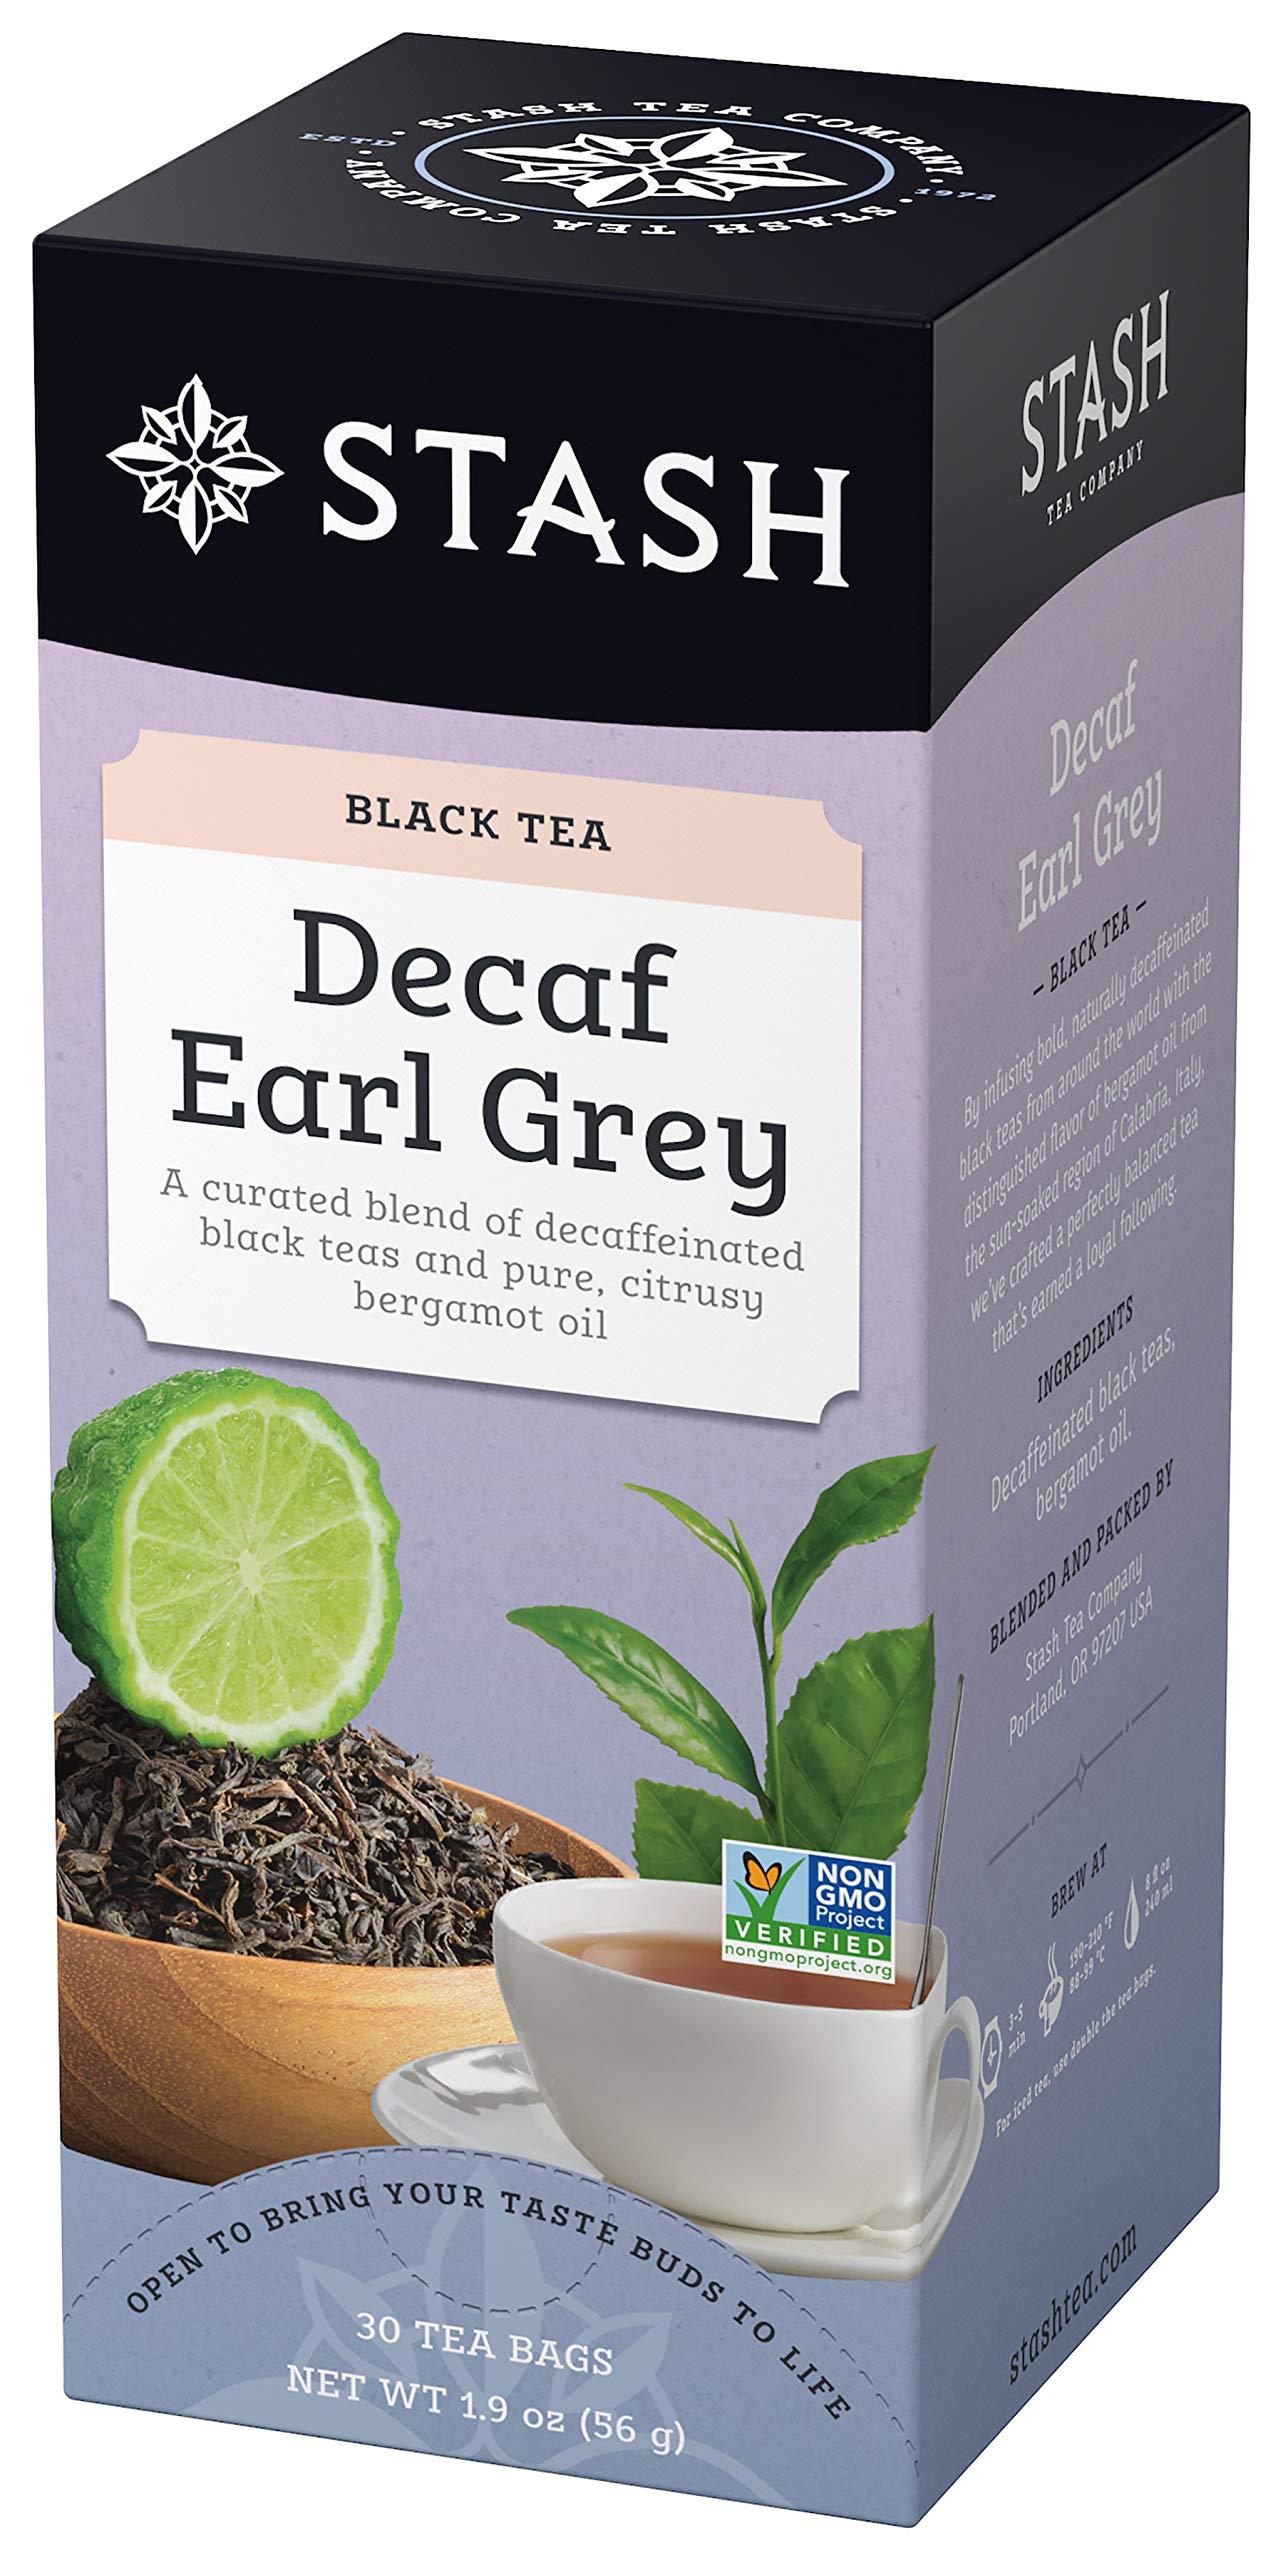 Stash Tea Decaf Earl Grey Black Tea 30 Count Tea Bags in Foil (Pack of 6) Individual Decaffeinated Black Tea Bags for Use in Teapots Mugs or Cups, Brew Hot Tea or Iced Tea